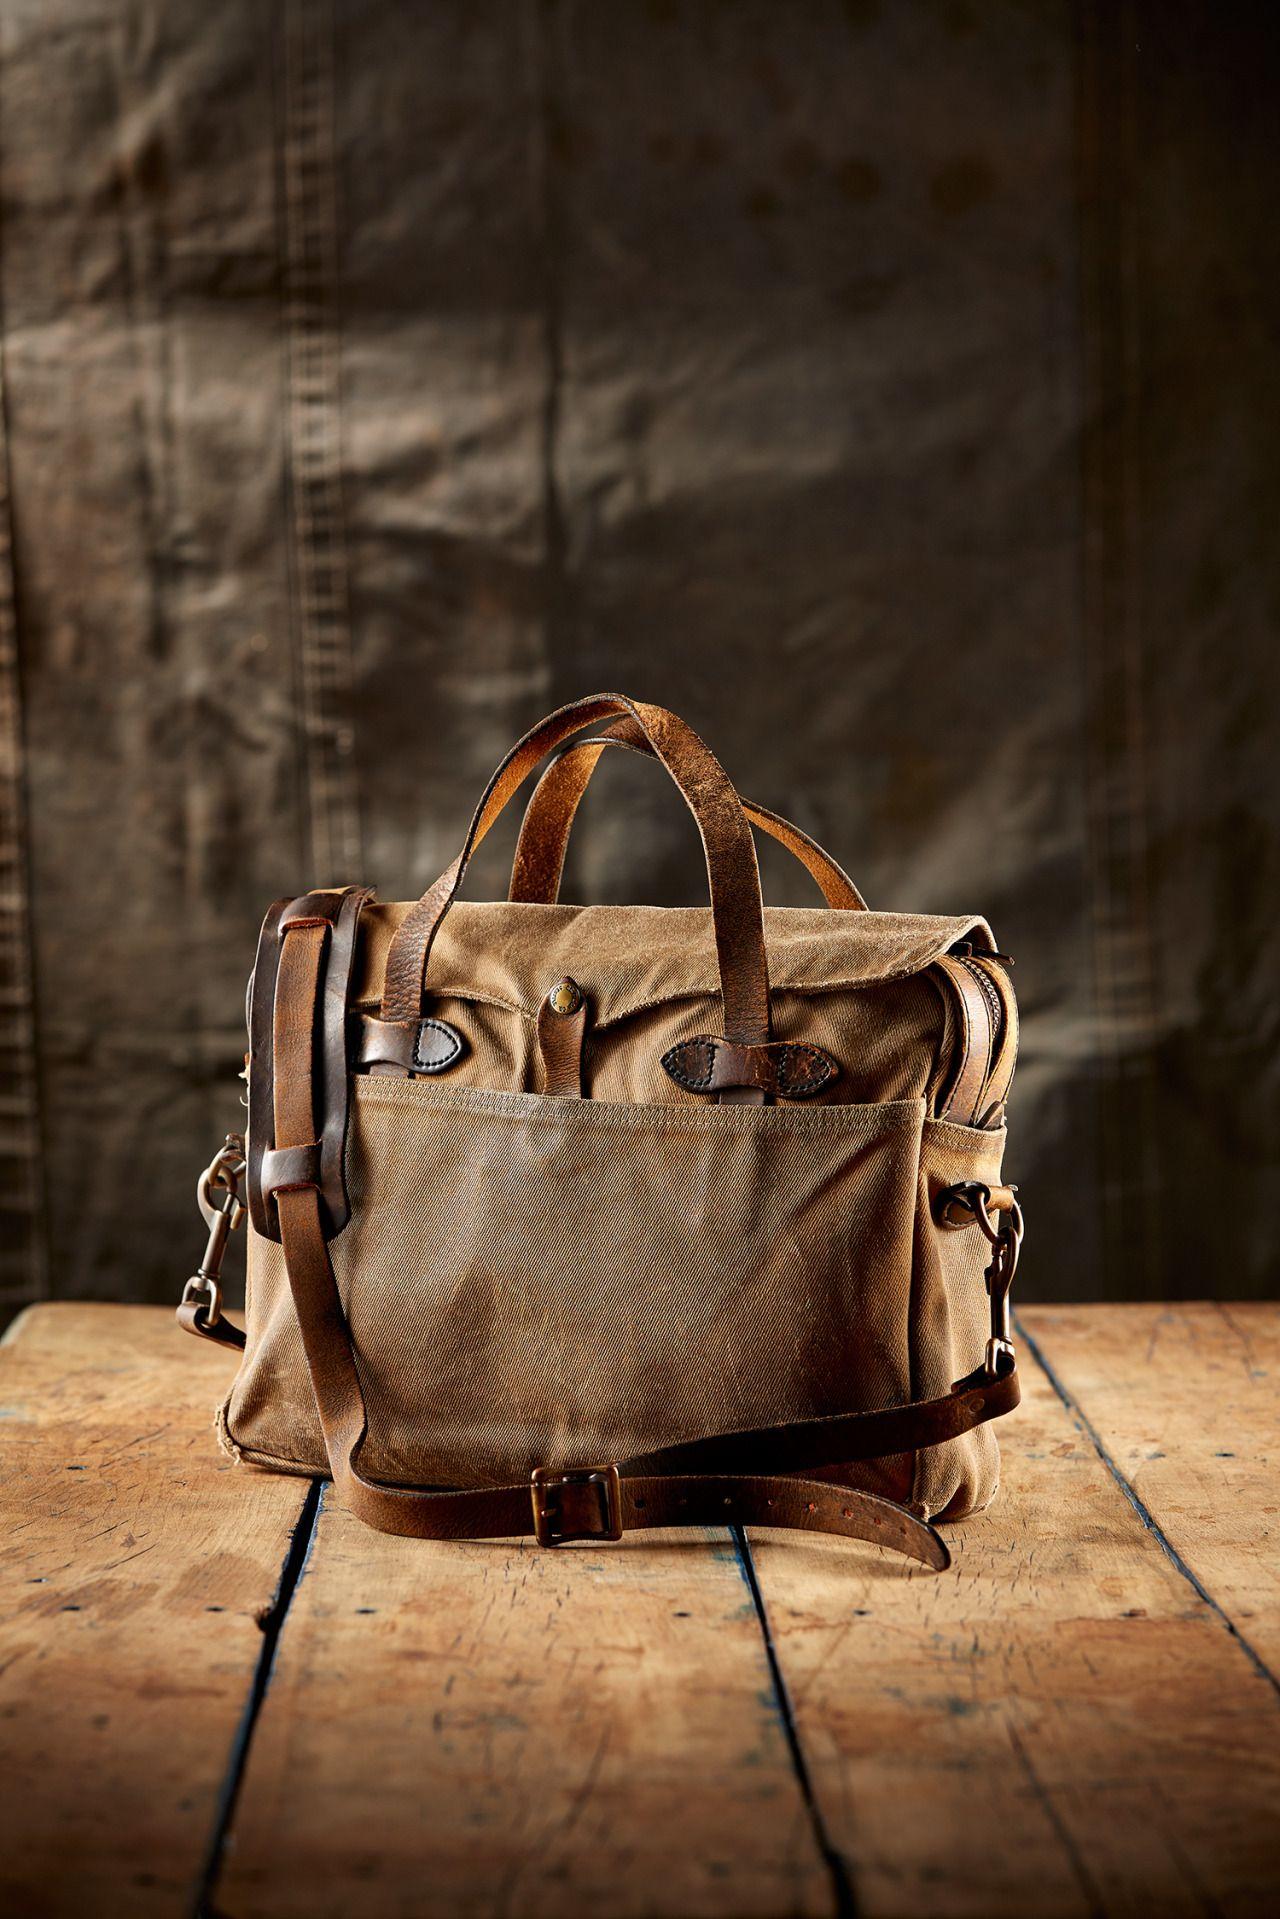 Filson Filson Bags Filson Briefcase Mens Fashion Rugged